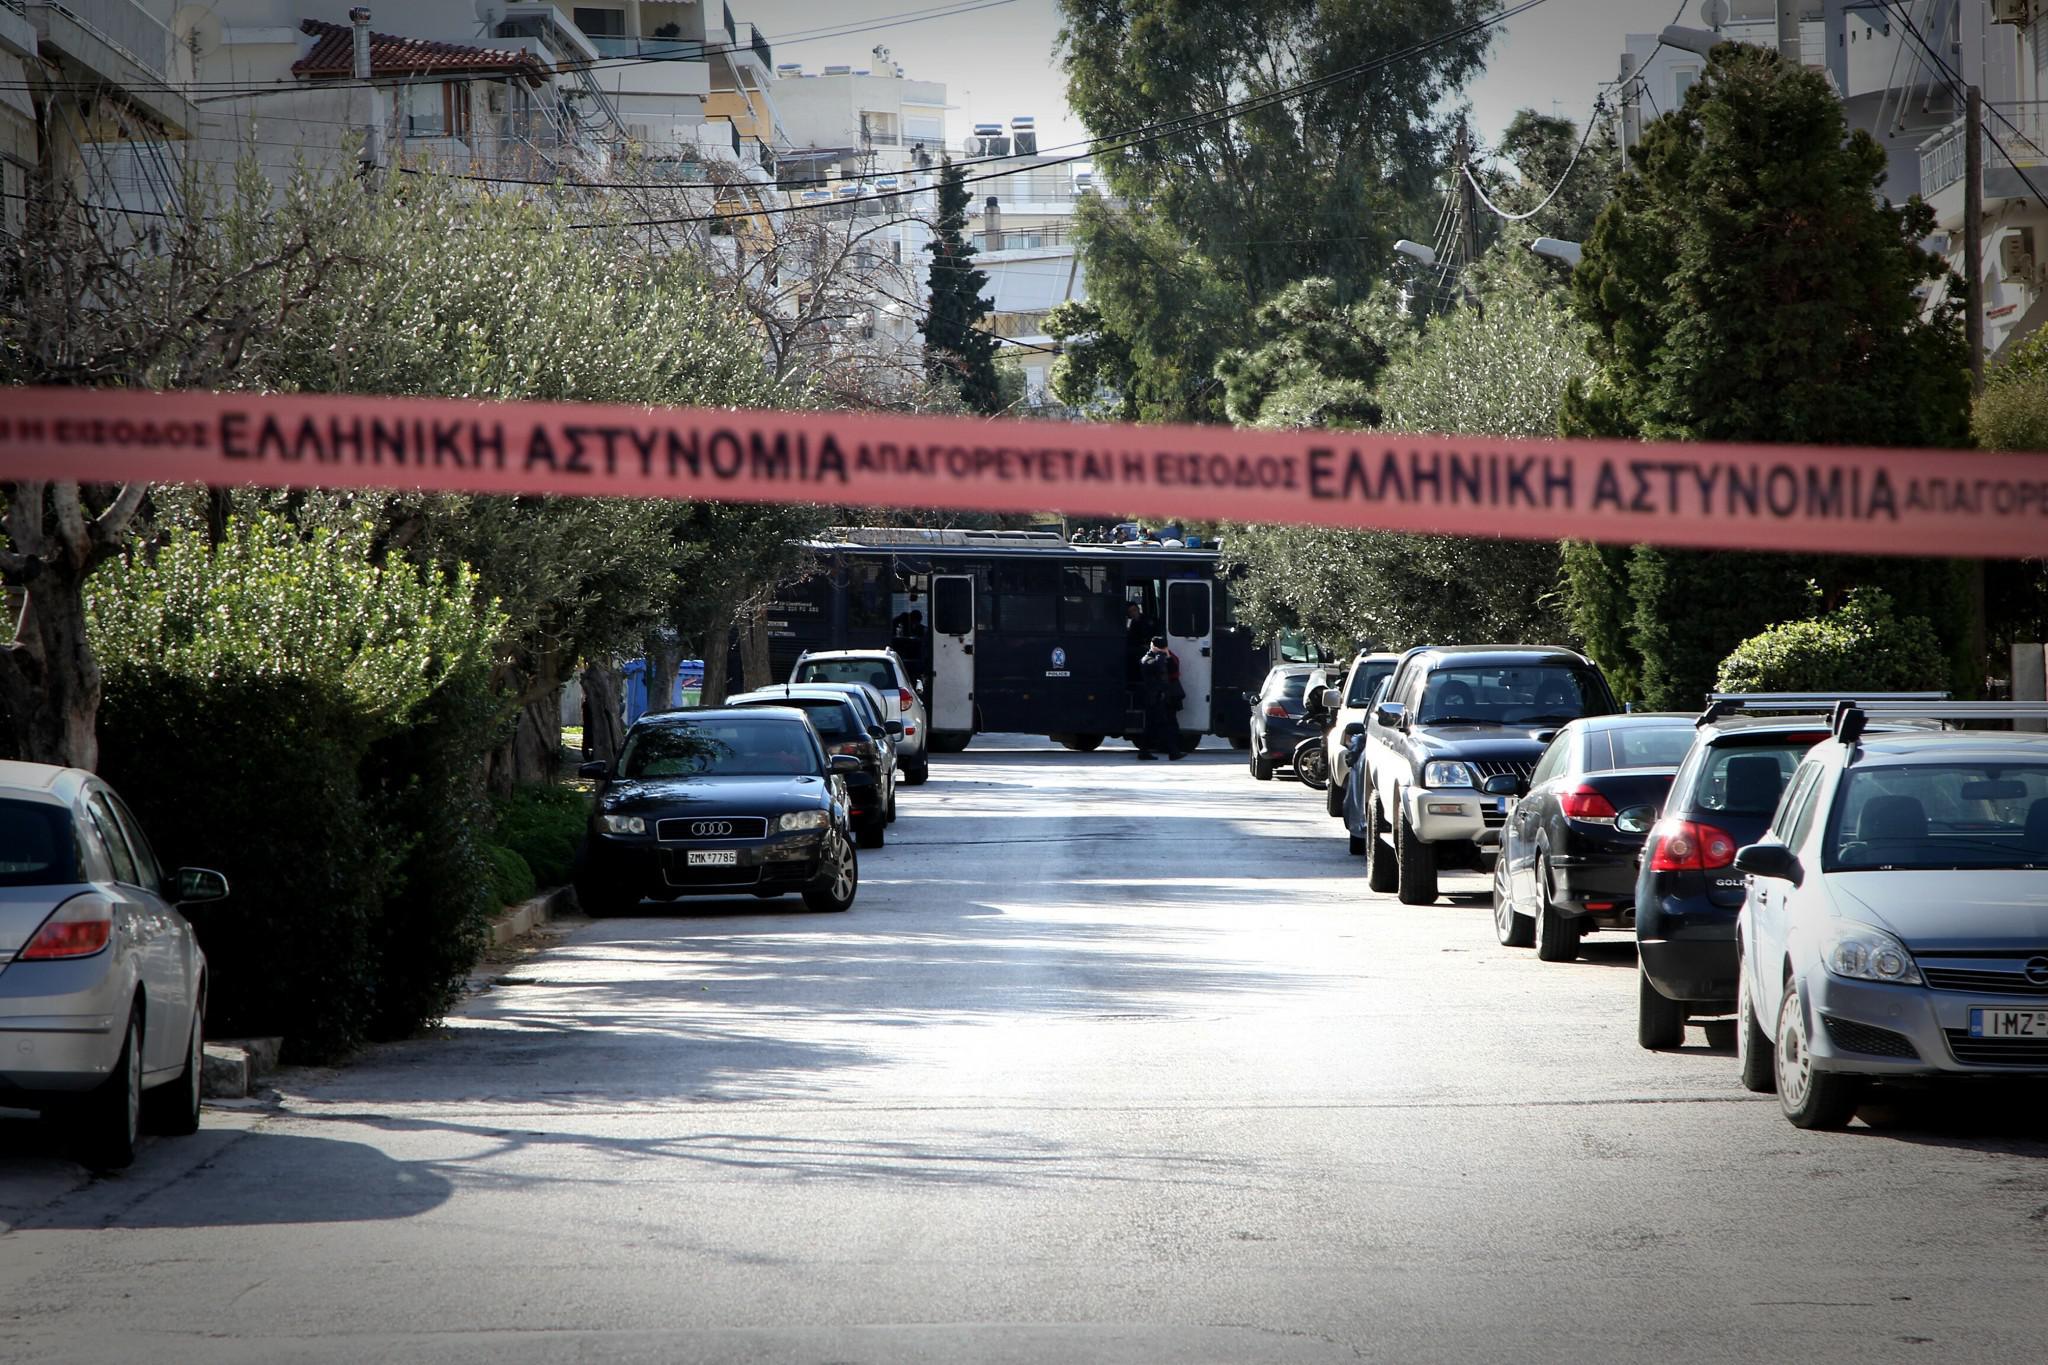 sullipsi-pola-roupa-antitromokratiki-maziotis-epanastatikos-agonas-5 Πώς έγινε η σύλληψη της συντρόφου του Νίκου Μαζιώτη, Πόλας Ρούπα –Τι είπε στους αστυνομικούς